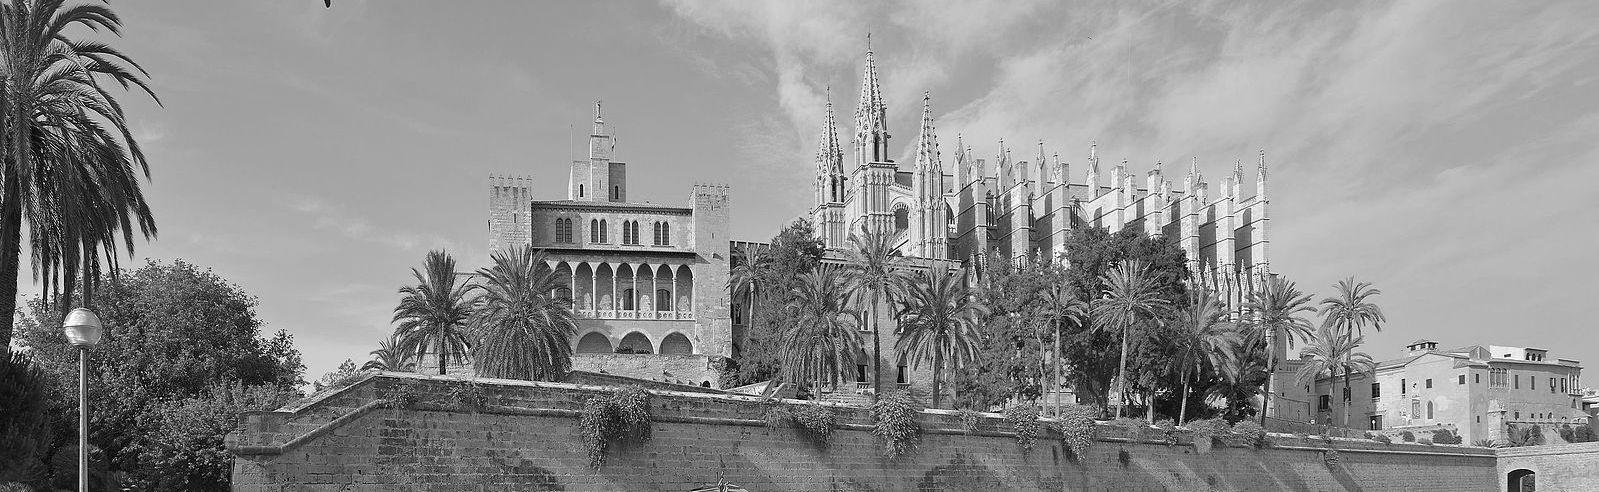 Palma_de_Mallorca_Royal_Palace_La_Almudaina_Cathedral